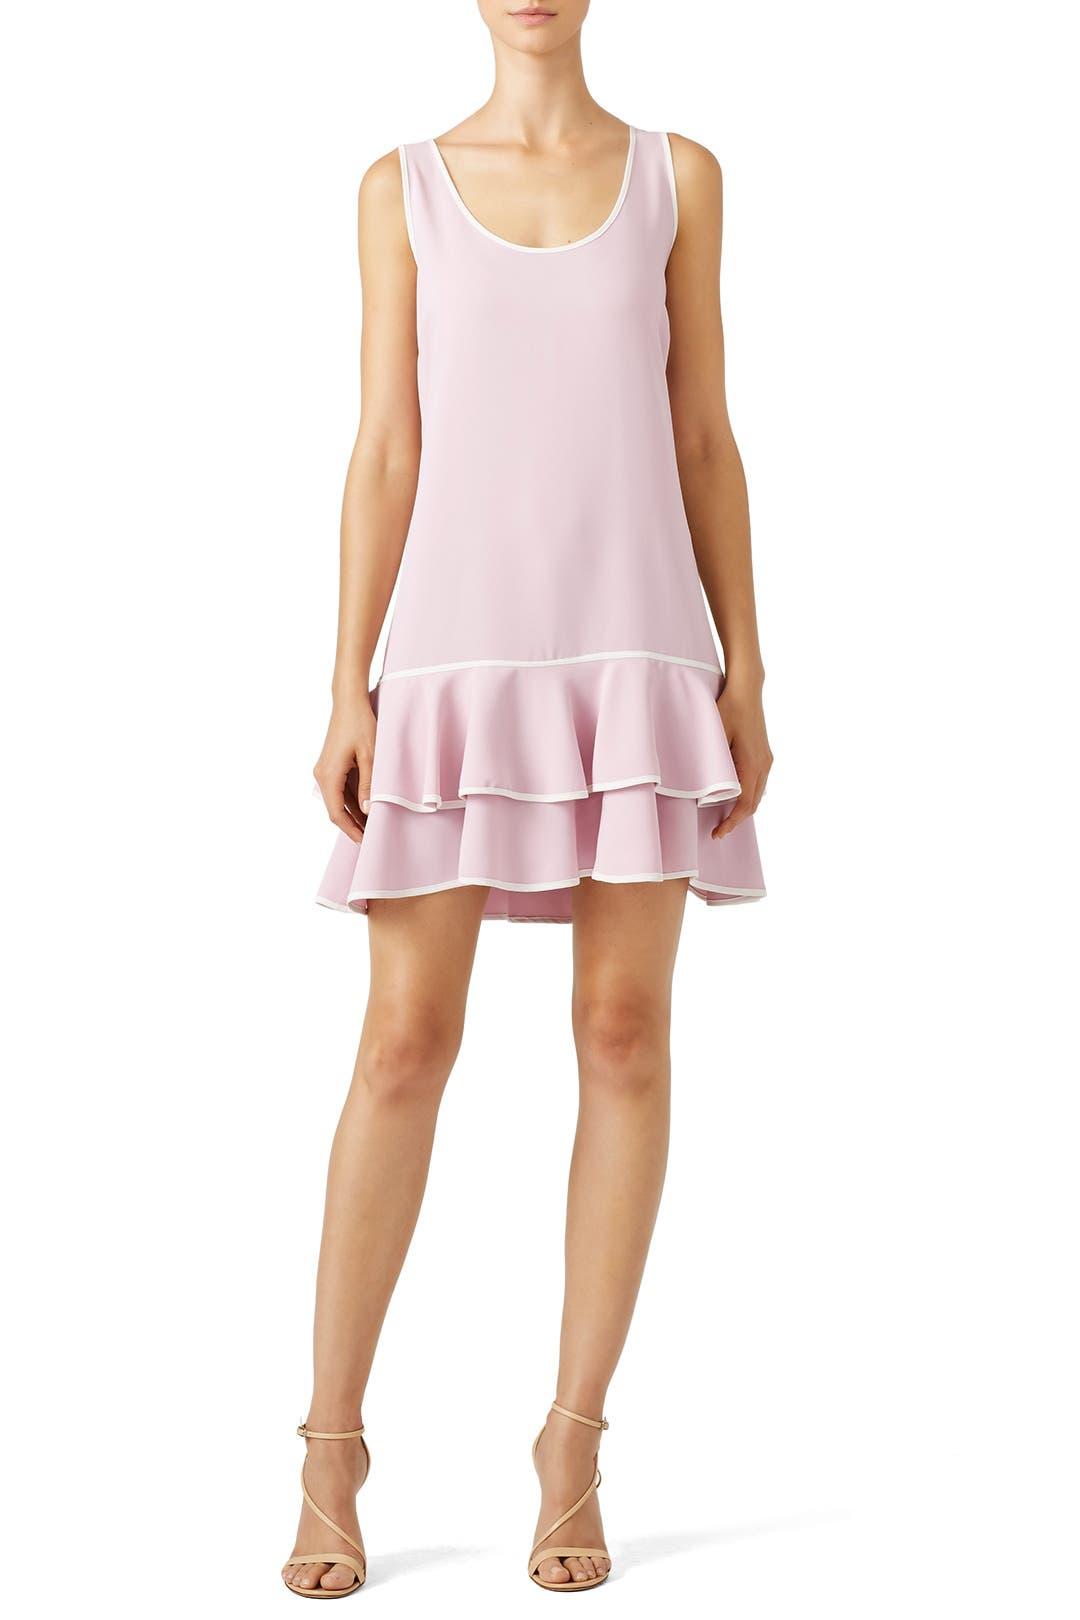 b762e4fc Dresses - Amanda Uprichard Great selection and prices for Wedding ...